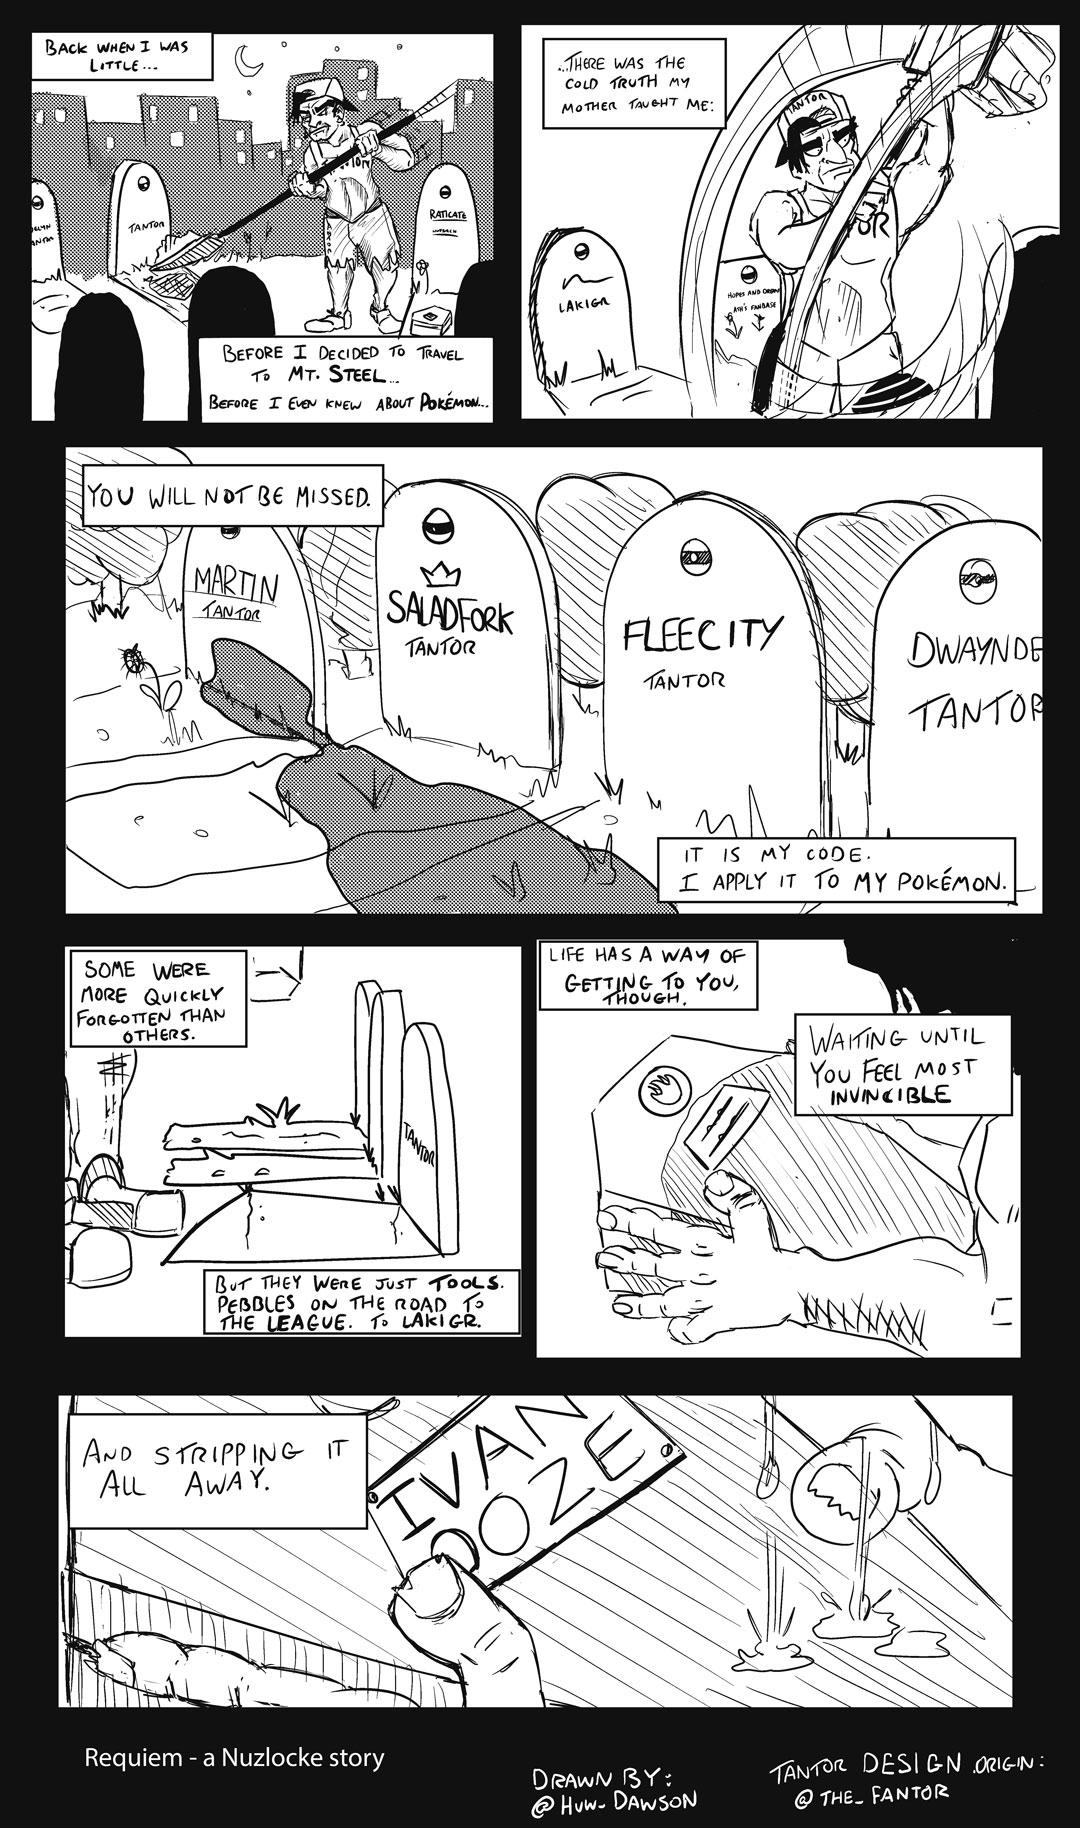 TFS Nuzlocke: Requiem for a Pokemon by YamiHuwgi on DeviantArt